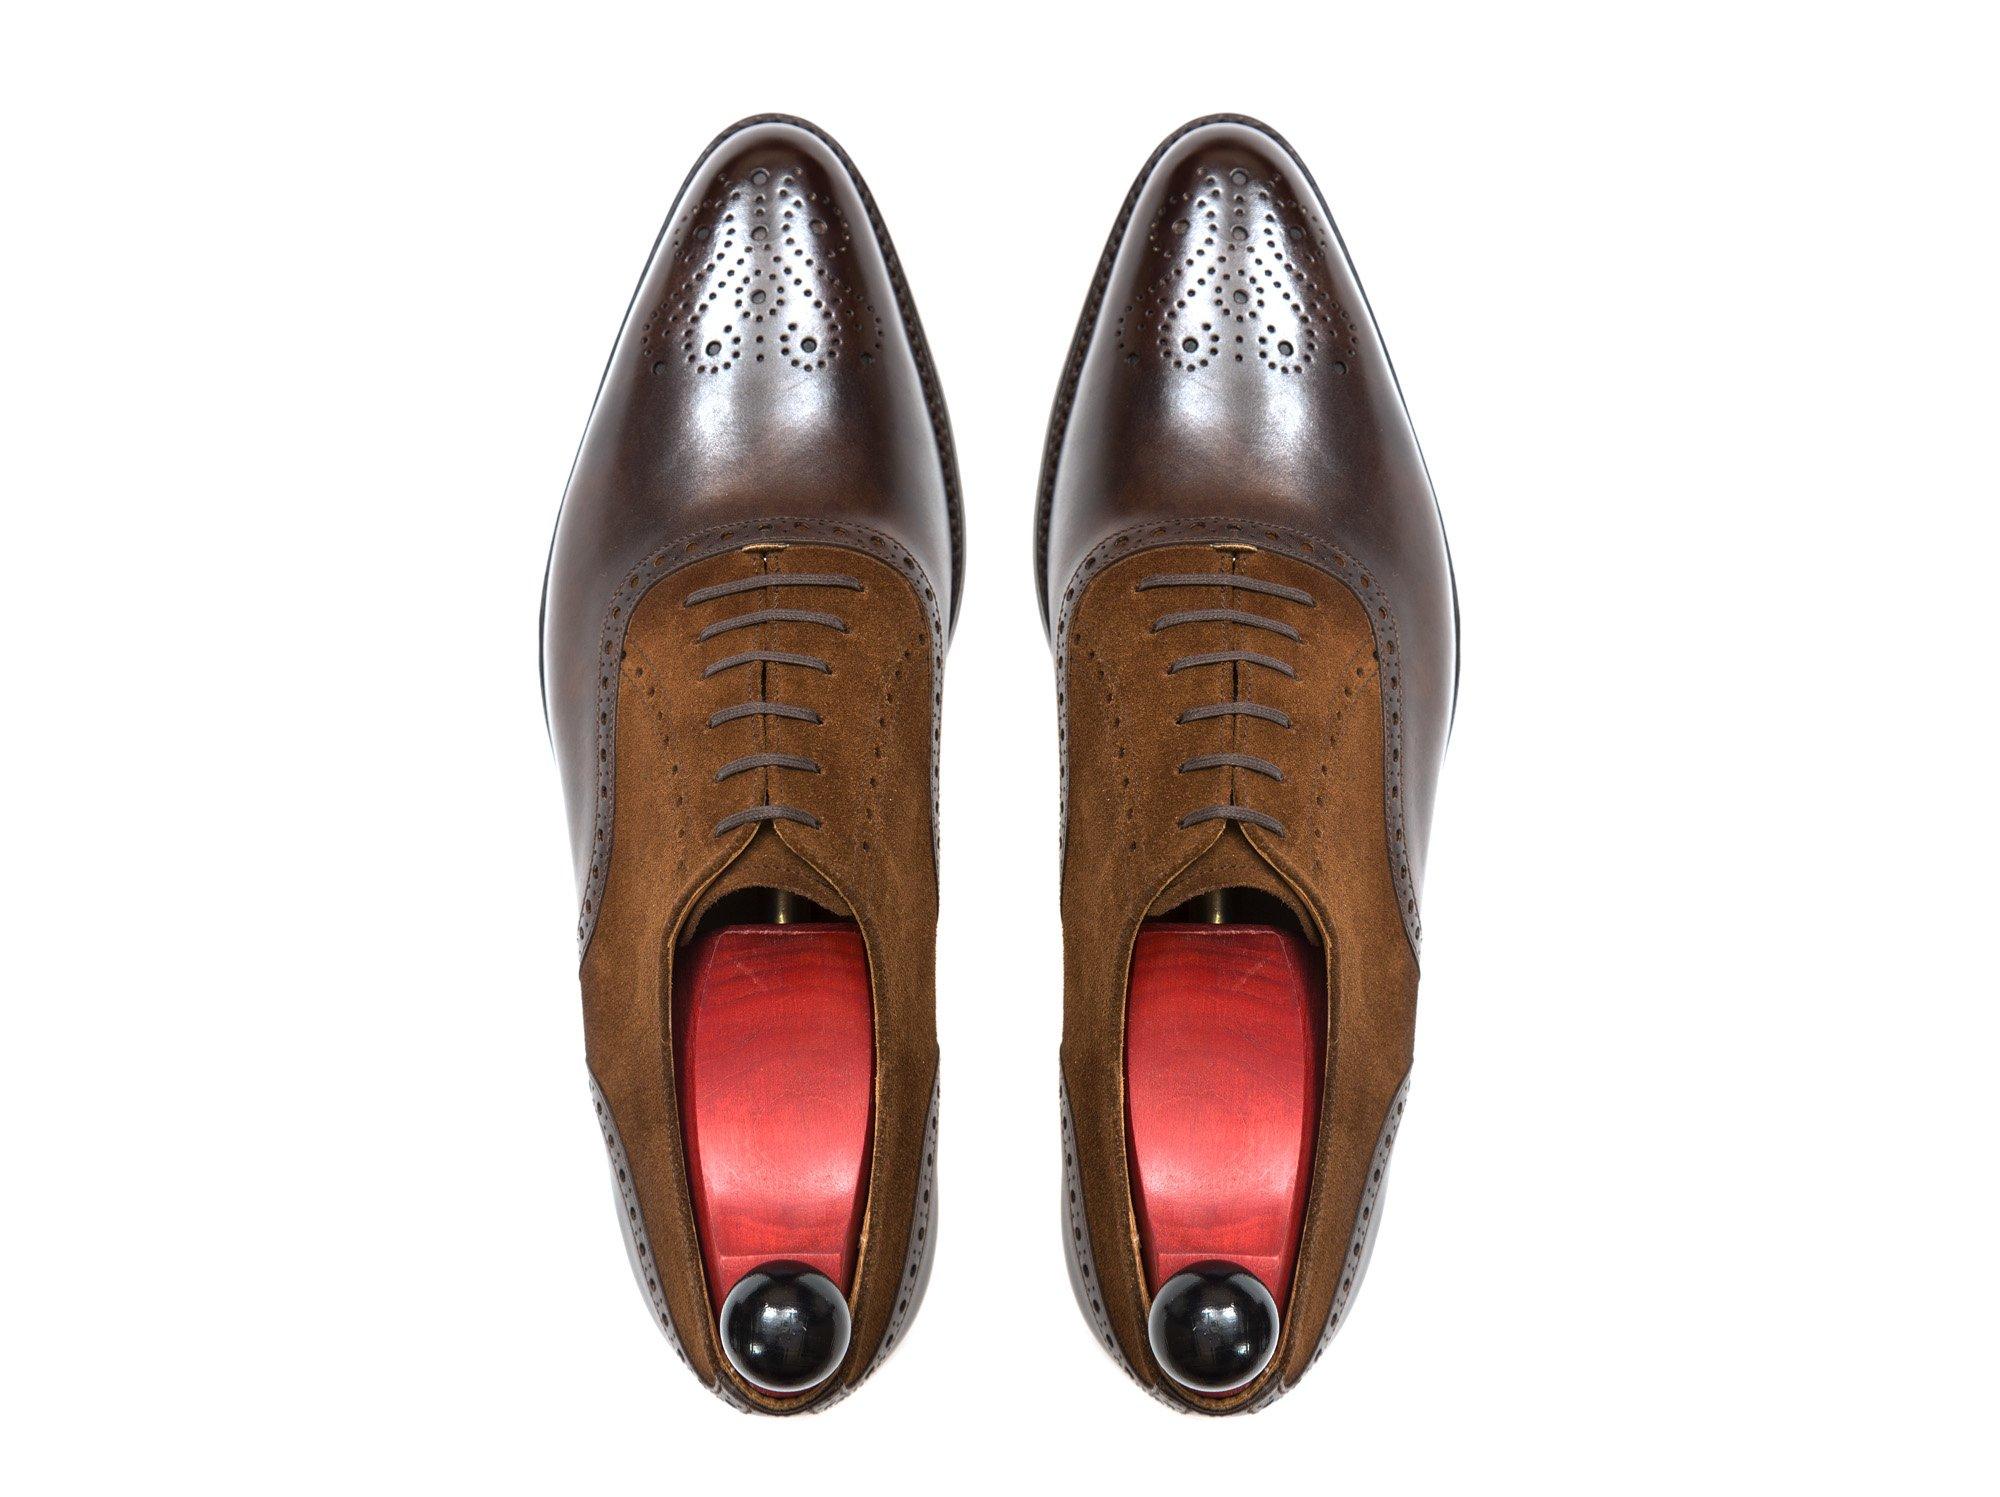 J.FitzPatrick Footwear JKF Last